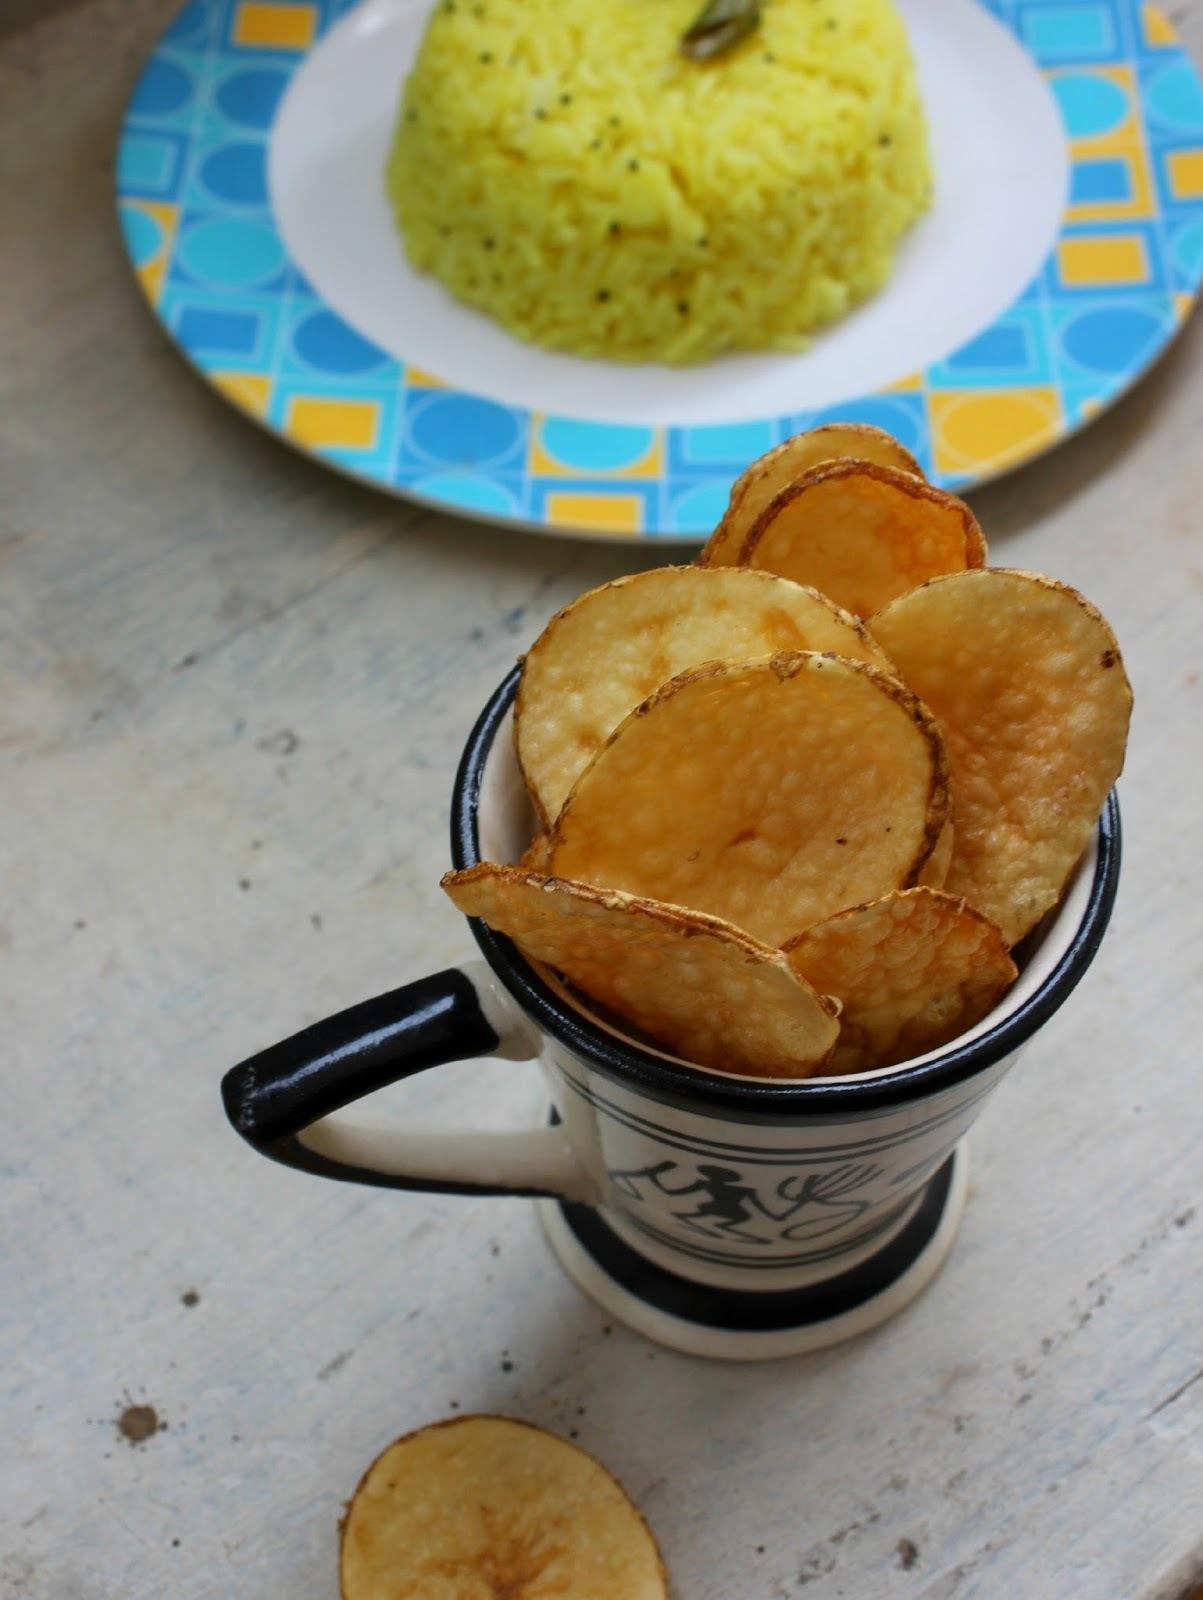 Potato Vathal | Urulaikizhangu vathal